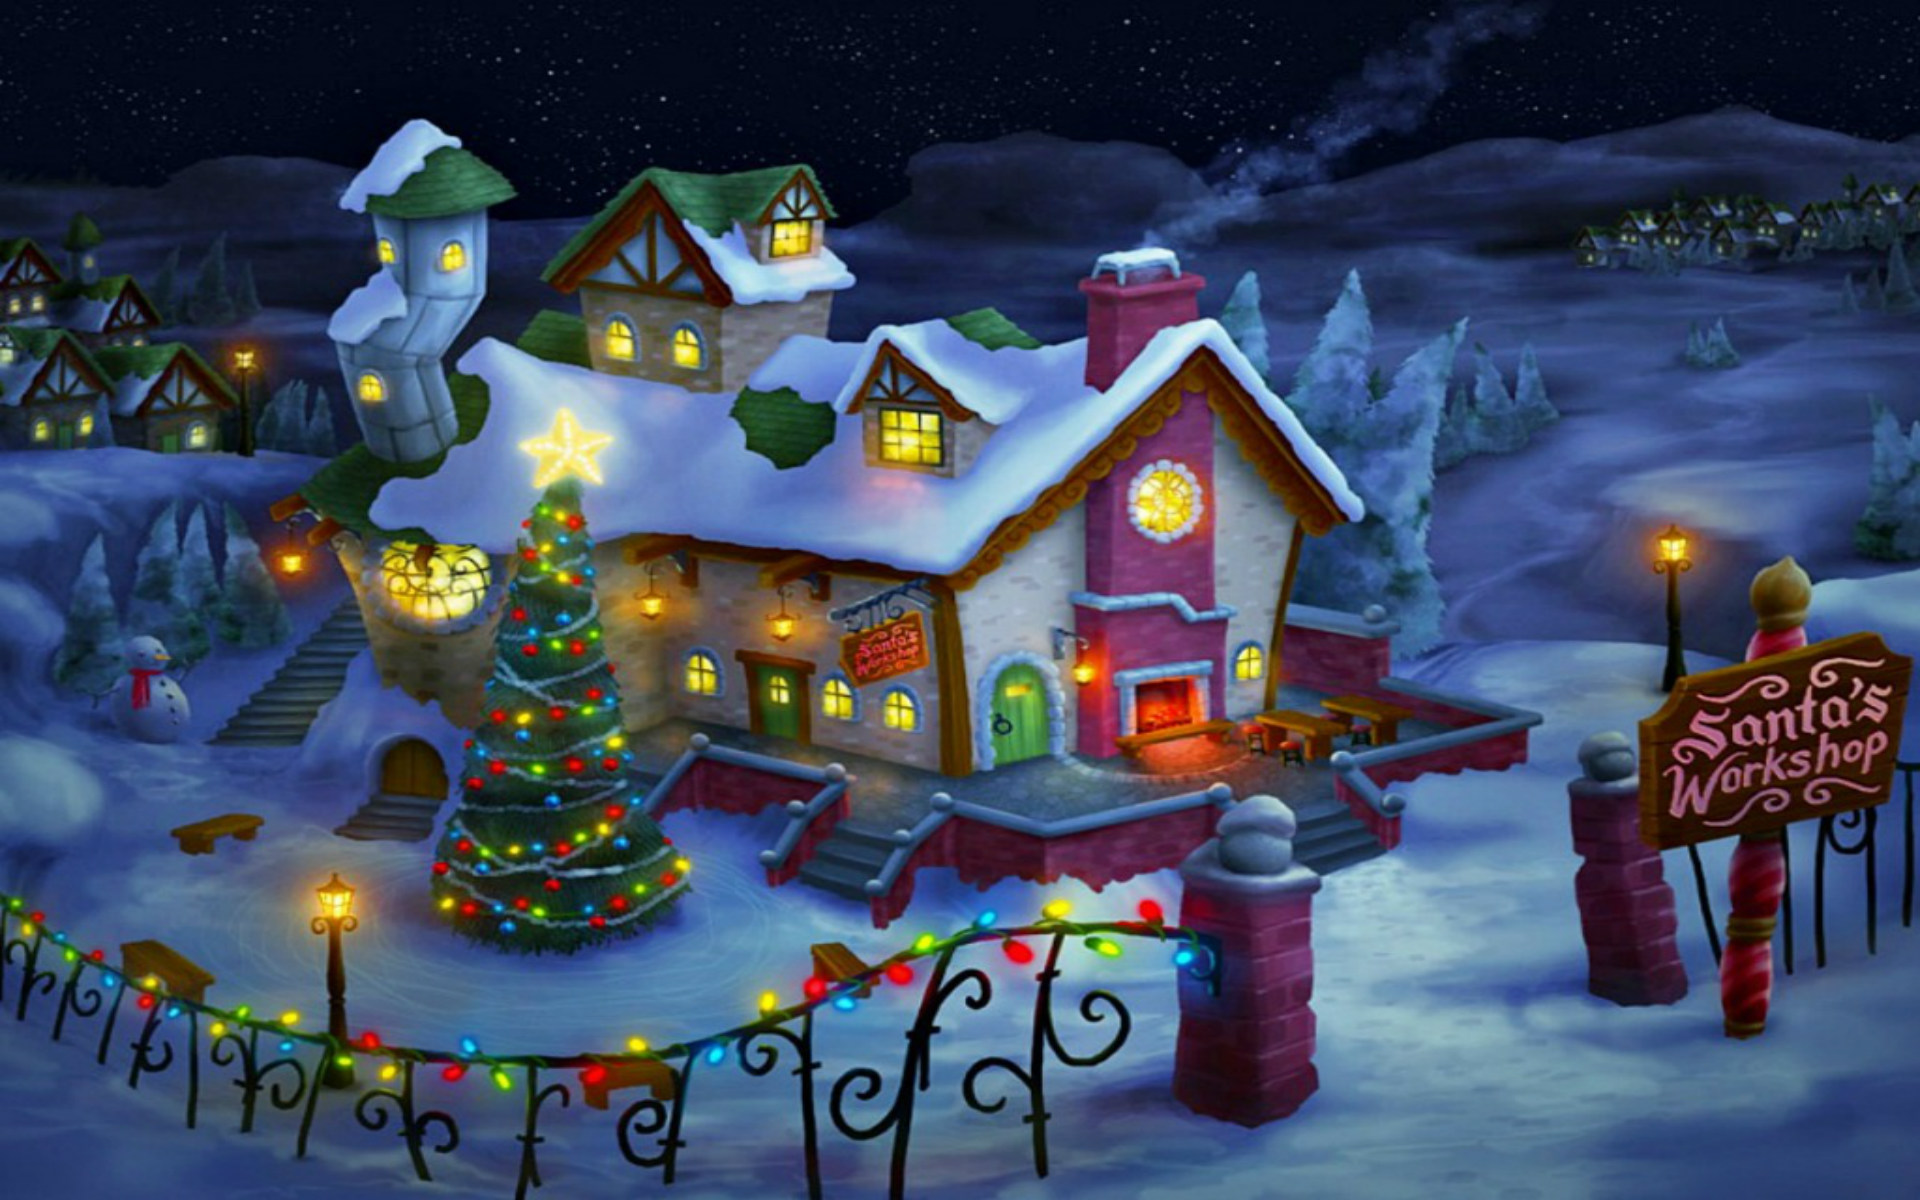 best merry christmas desktop background for pc laptop mac 1920x1200 - Christmas Desktop Background